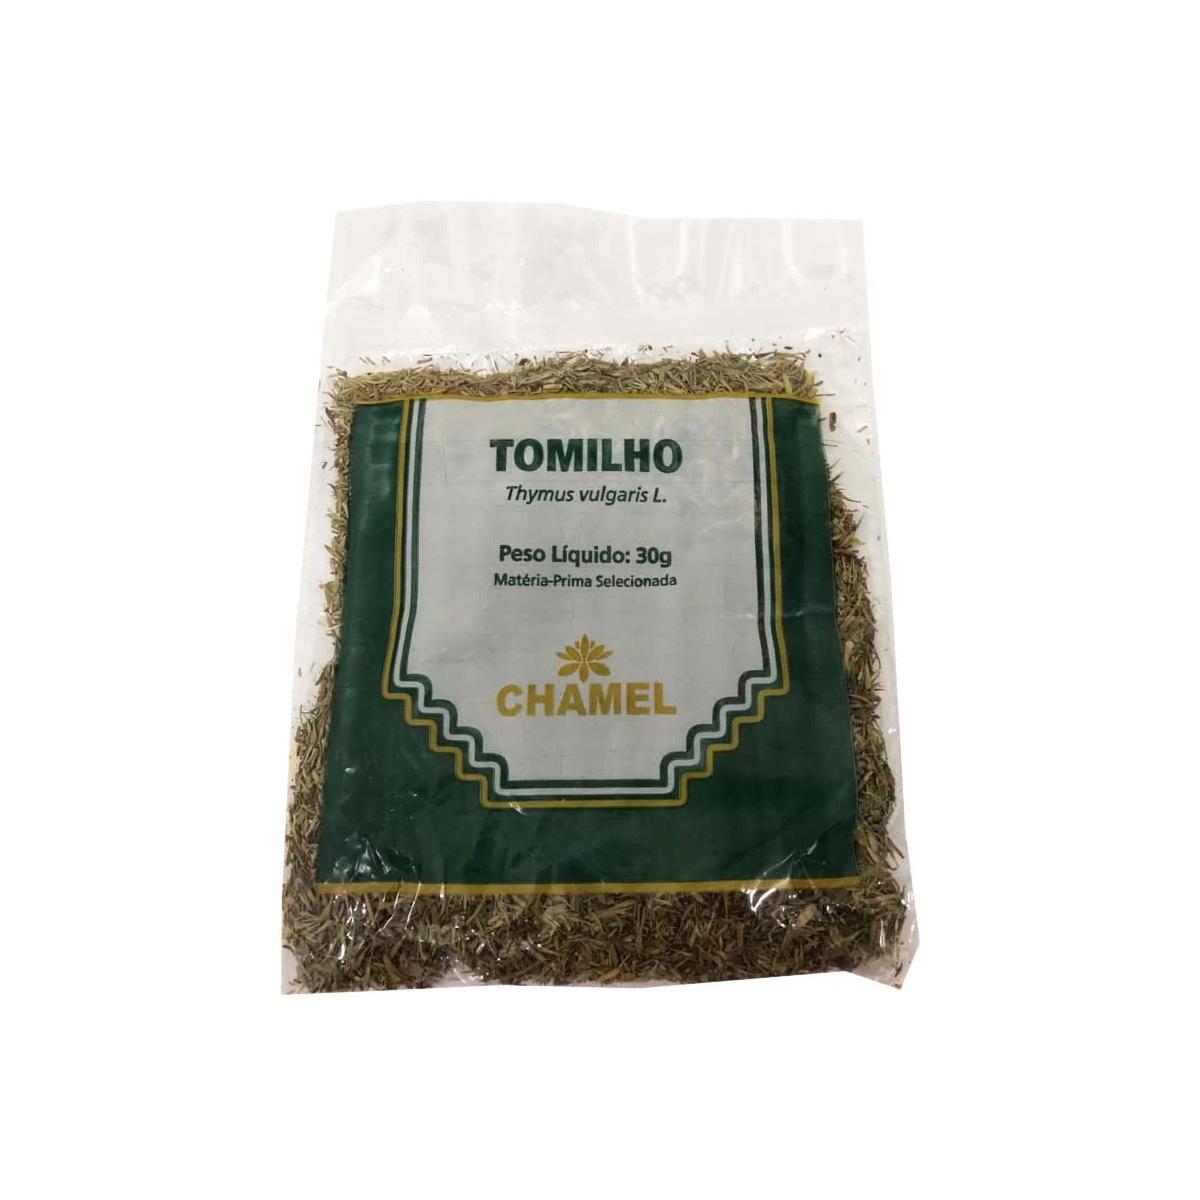 Tomilho 30g - Chamel